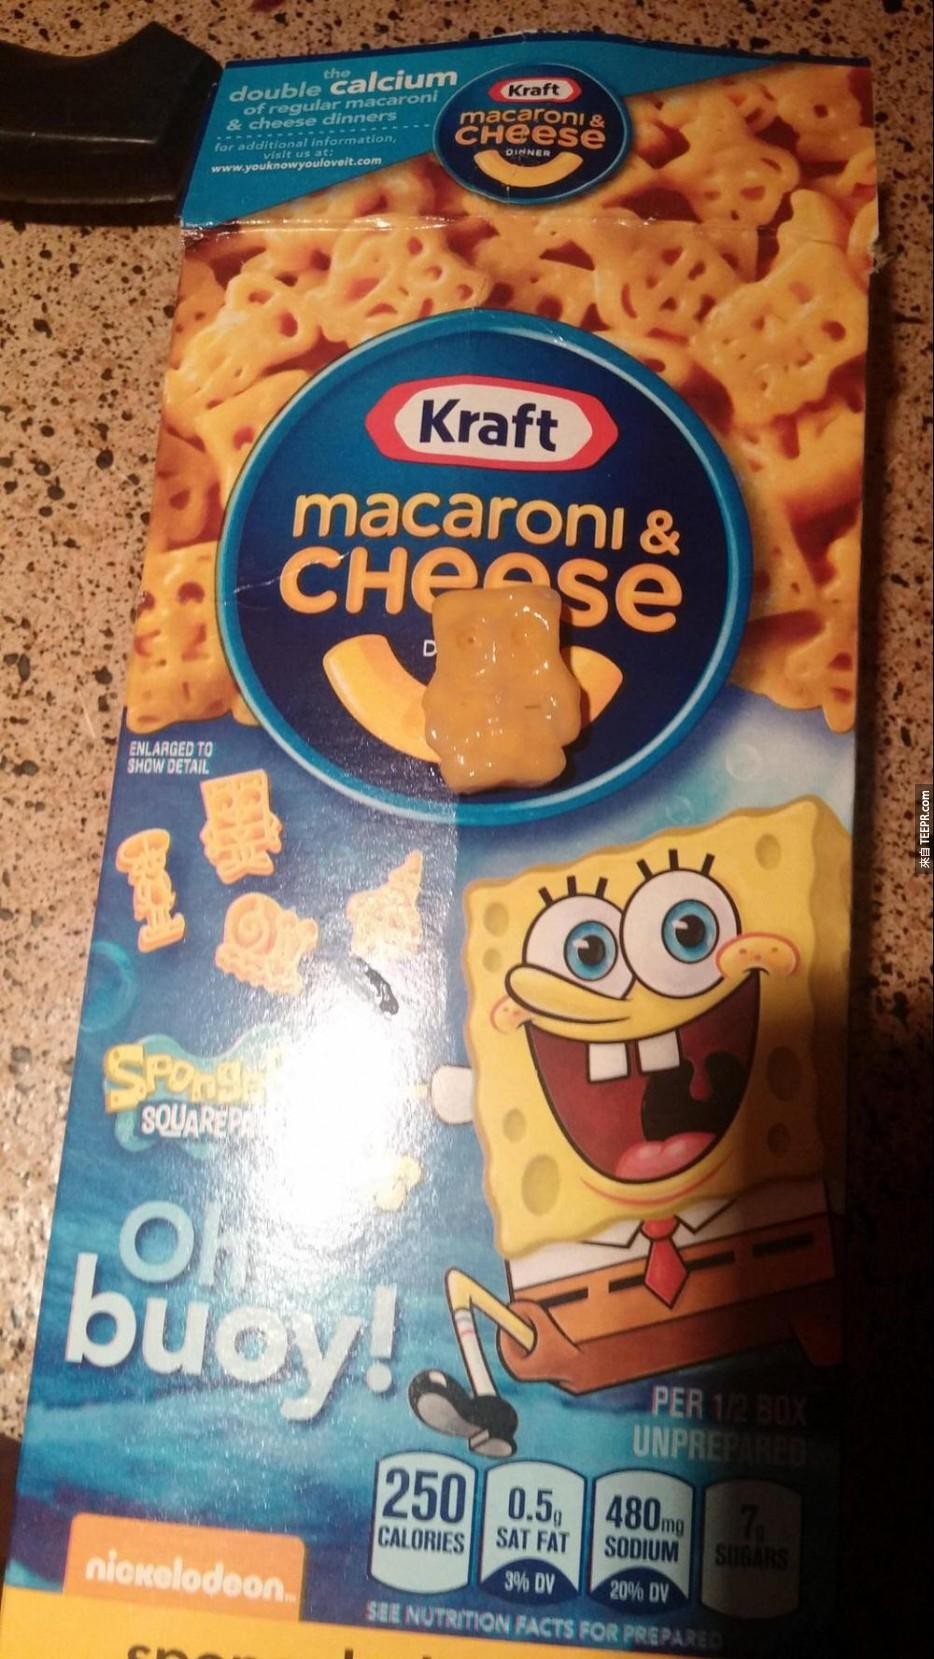 Spongebox%20MacaroniPants%20isn%u2019t%20looking%20too%20good.